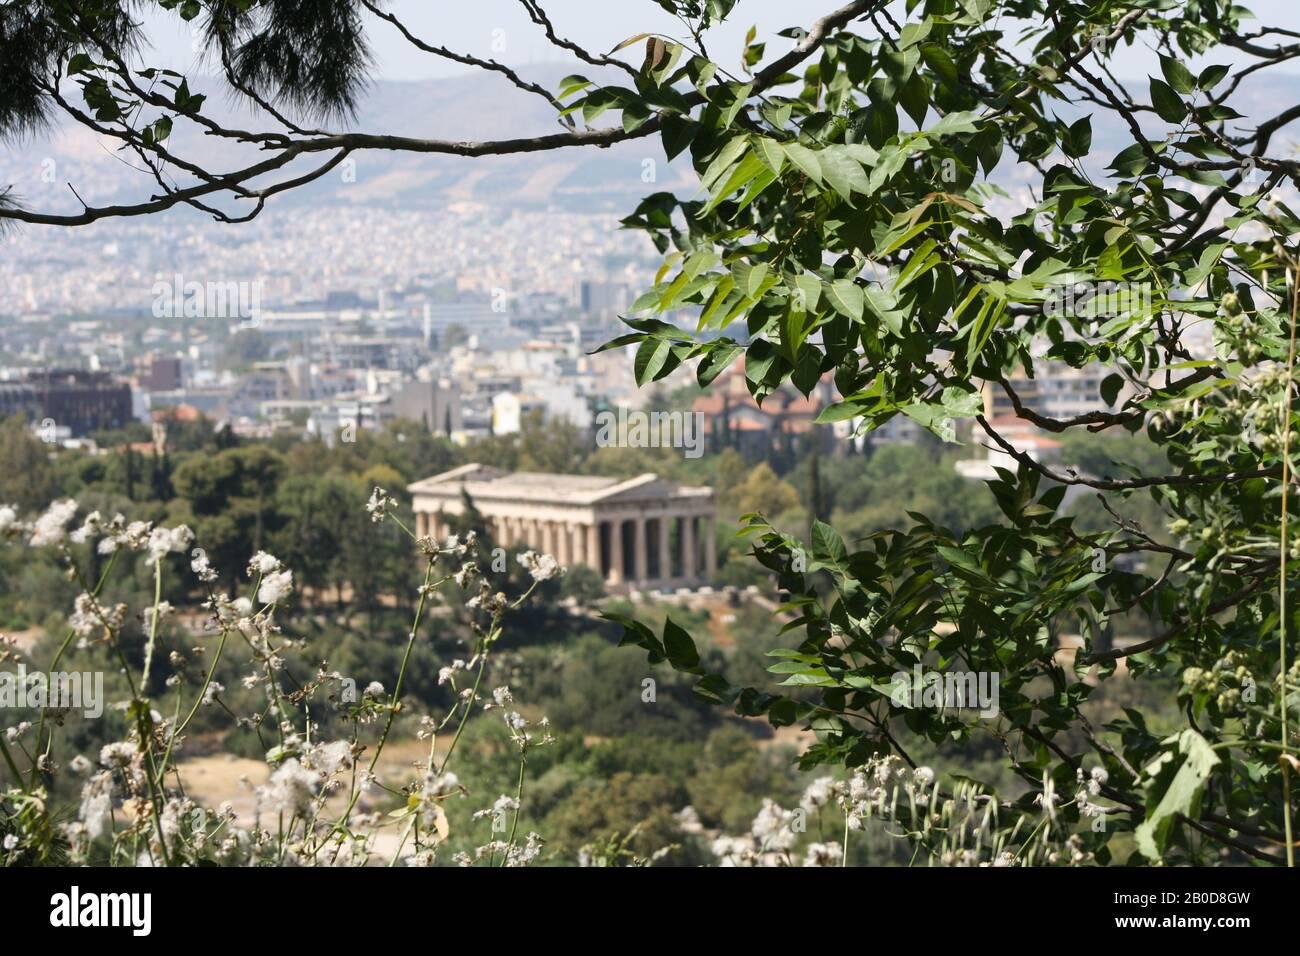 View from the Acropolis to the Temple of Hephaestus. Blick von der Akropolis auf den Tempel des Hephaistos. Stock Photo